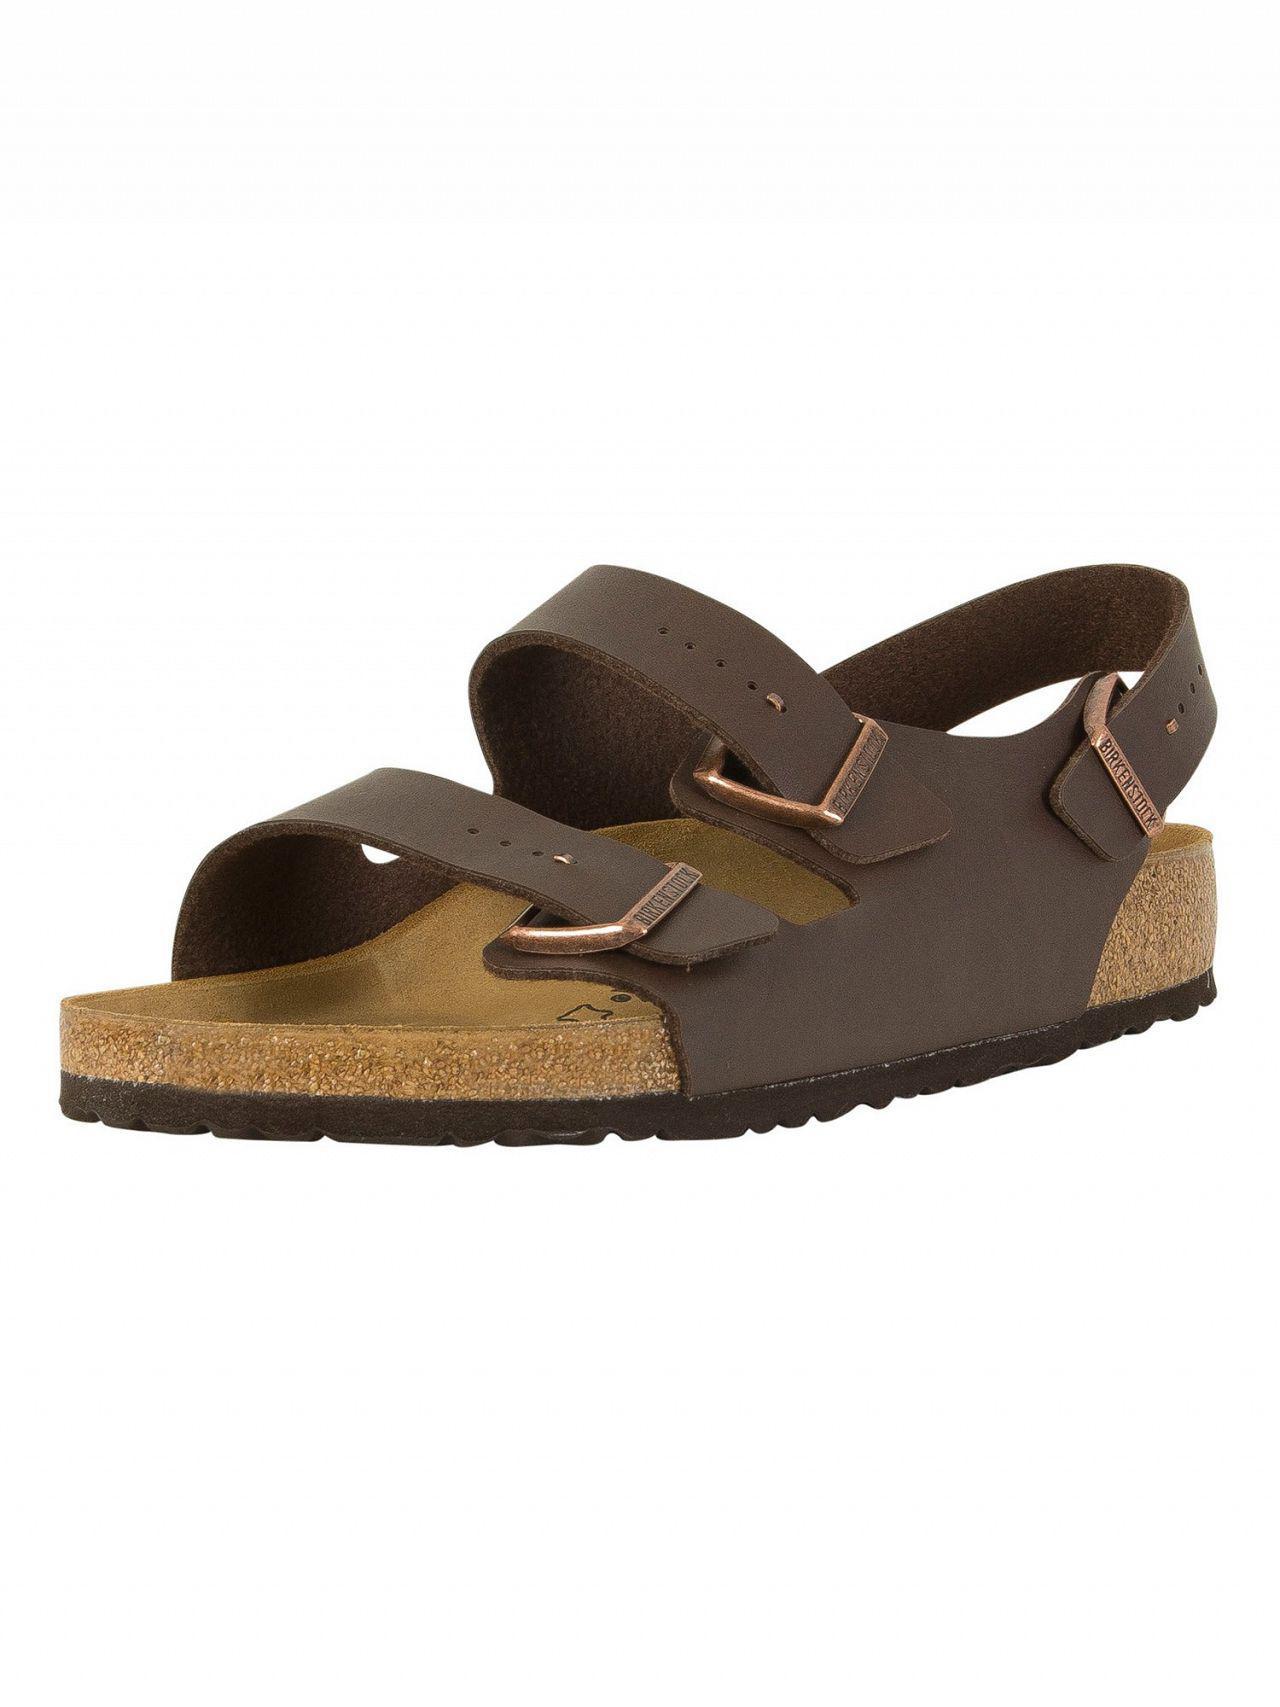 479629be0665 Lyst - Birkenstock Dark Brown Milano Sandals in Brown for Men - Save 7%